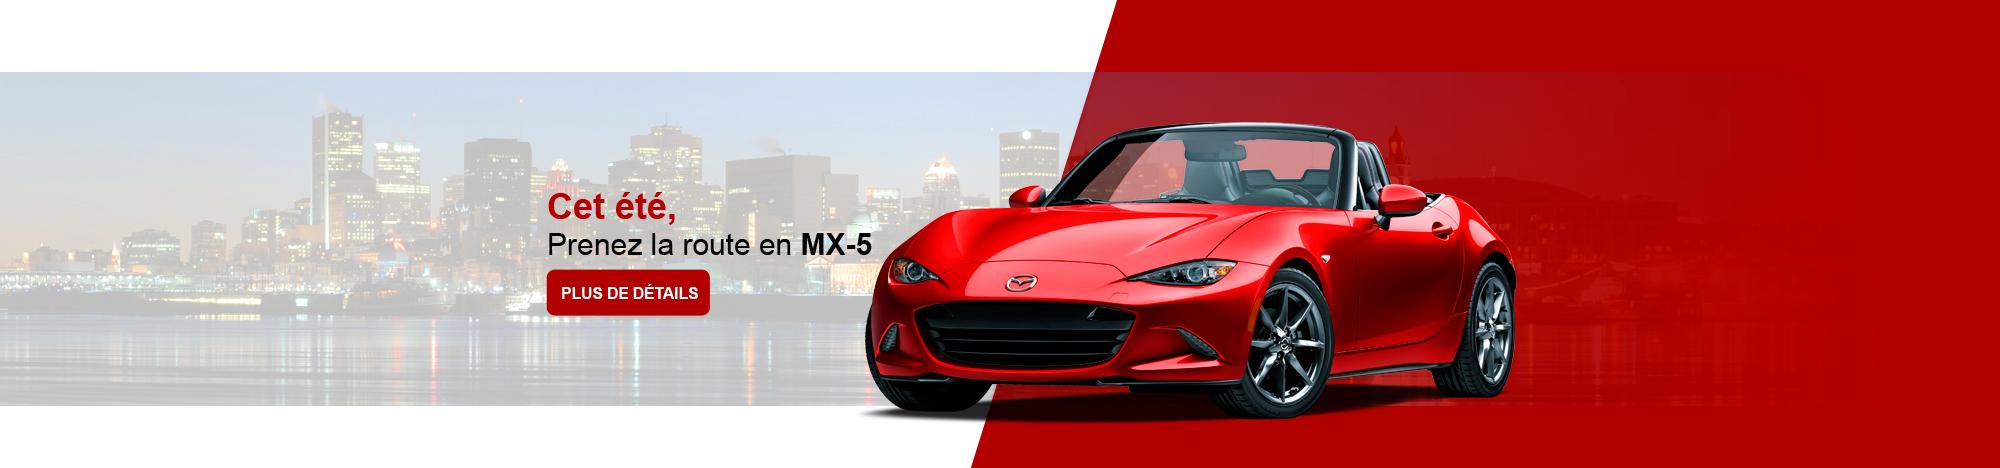 La Mazda MX-5 2017 ! (Copie)